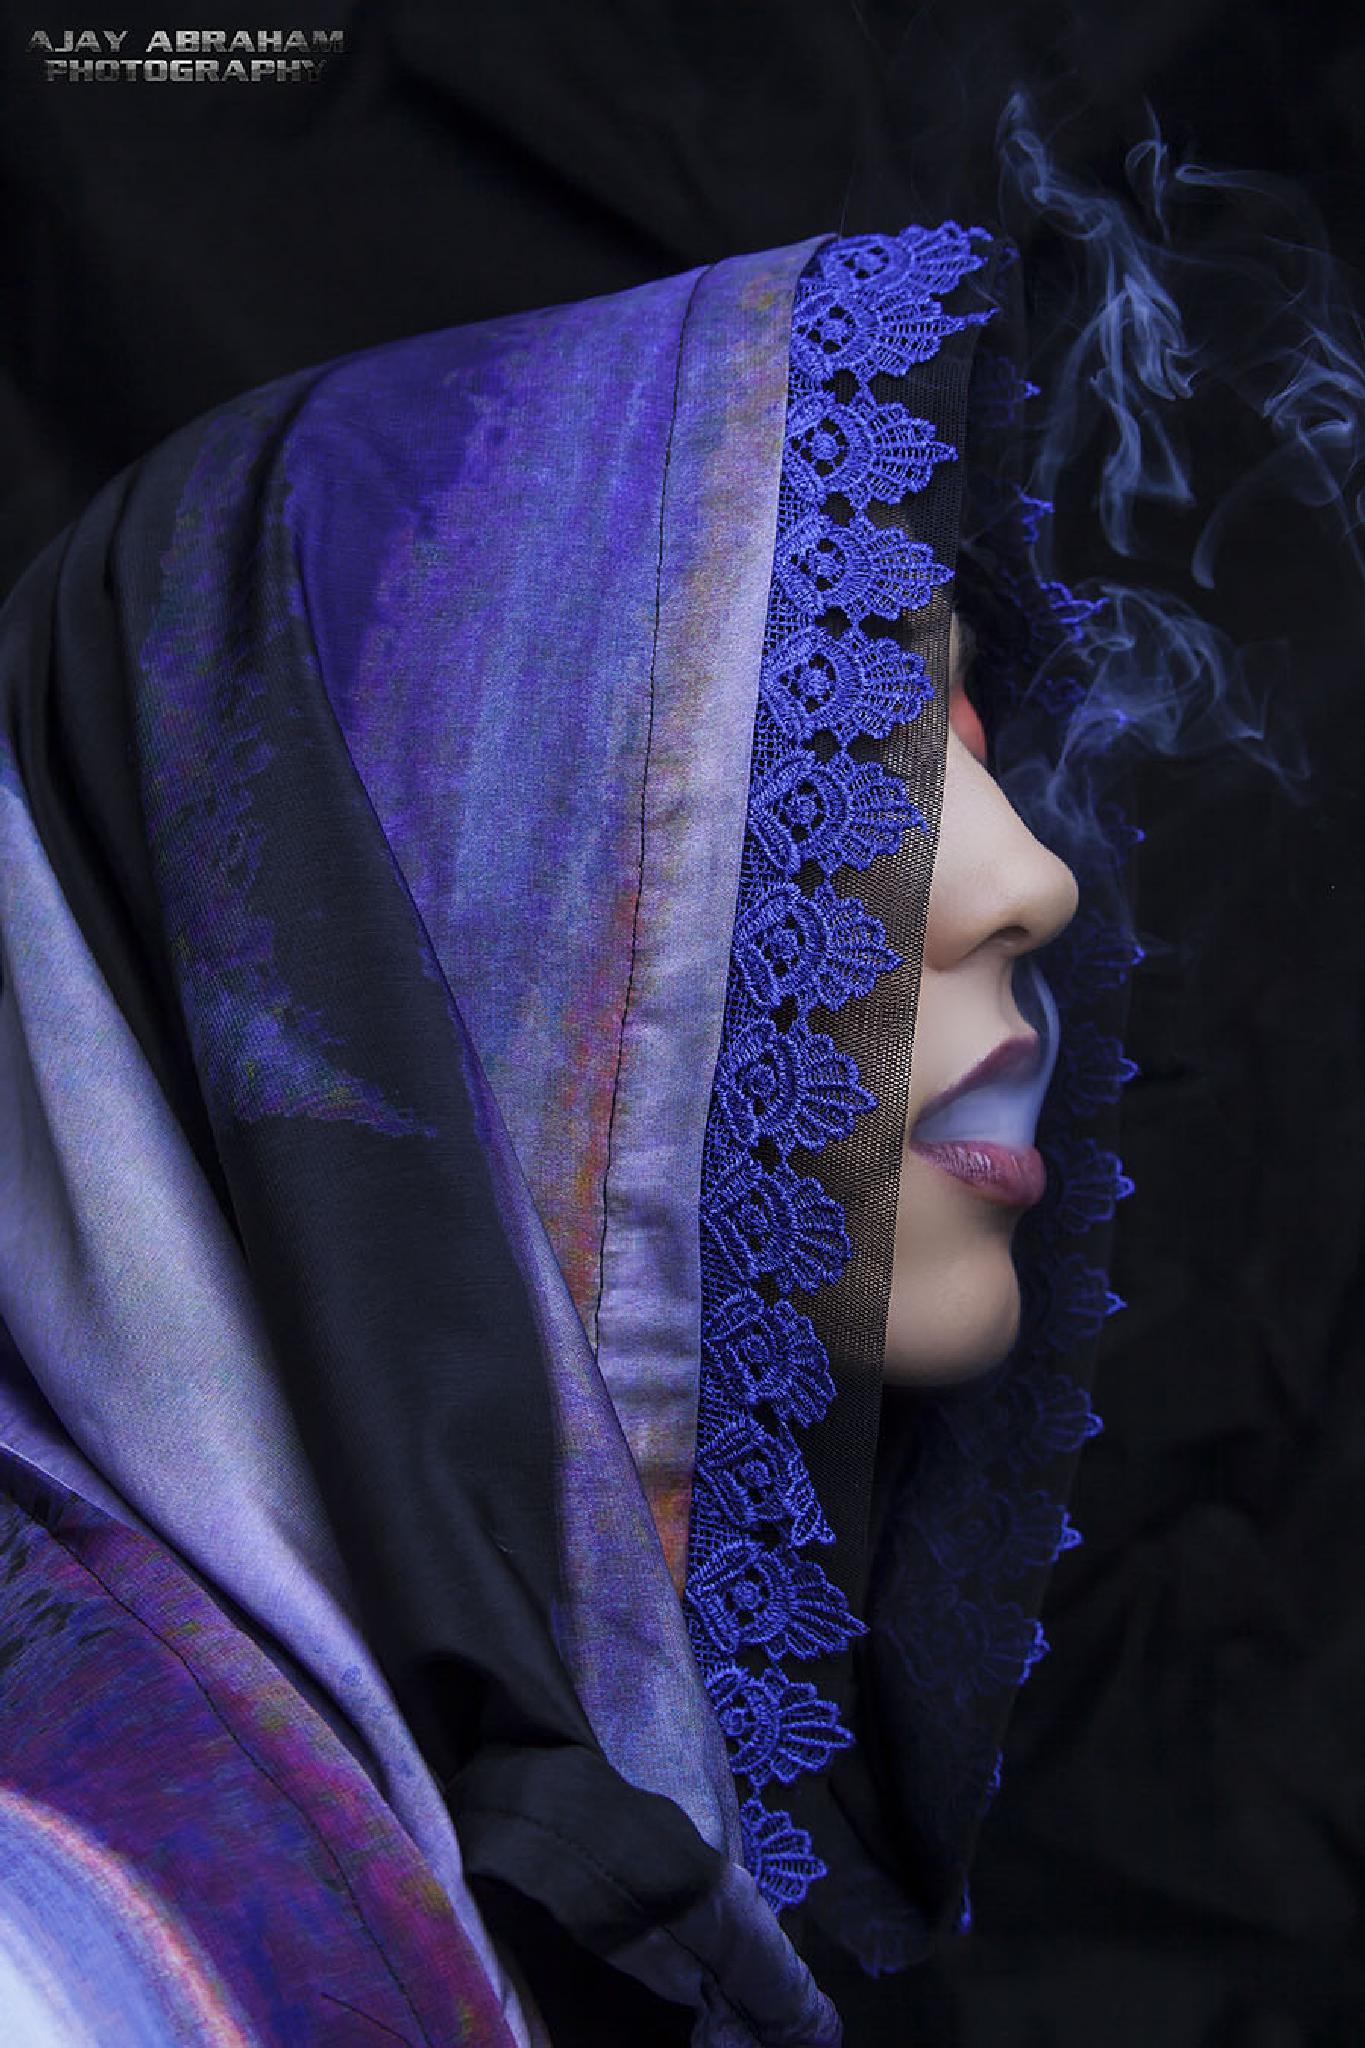 Designer Nina(Nali) ~ High Fashion/Beauty by ajayabraham2